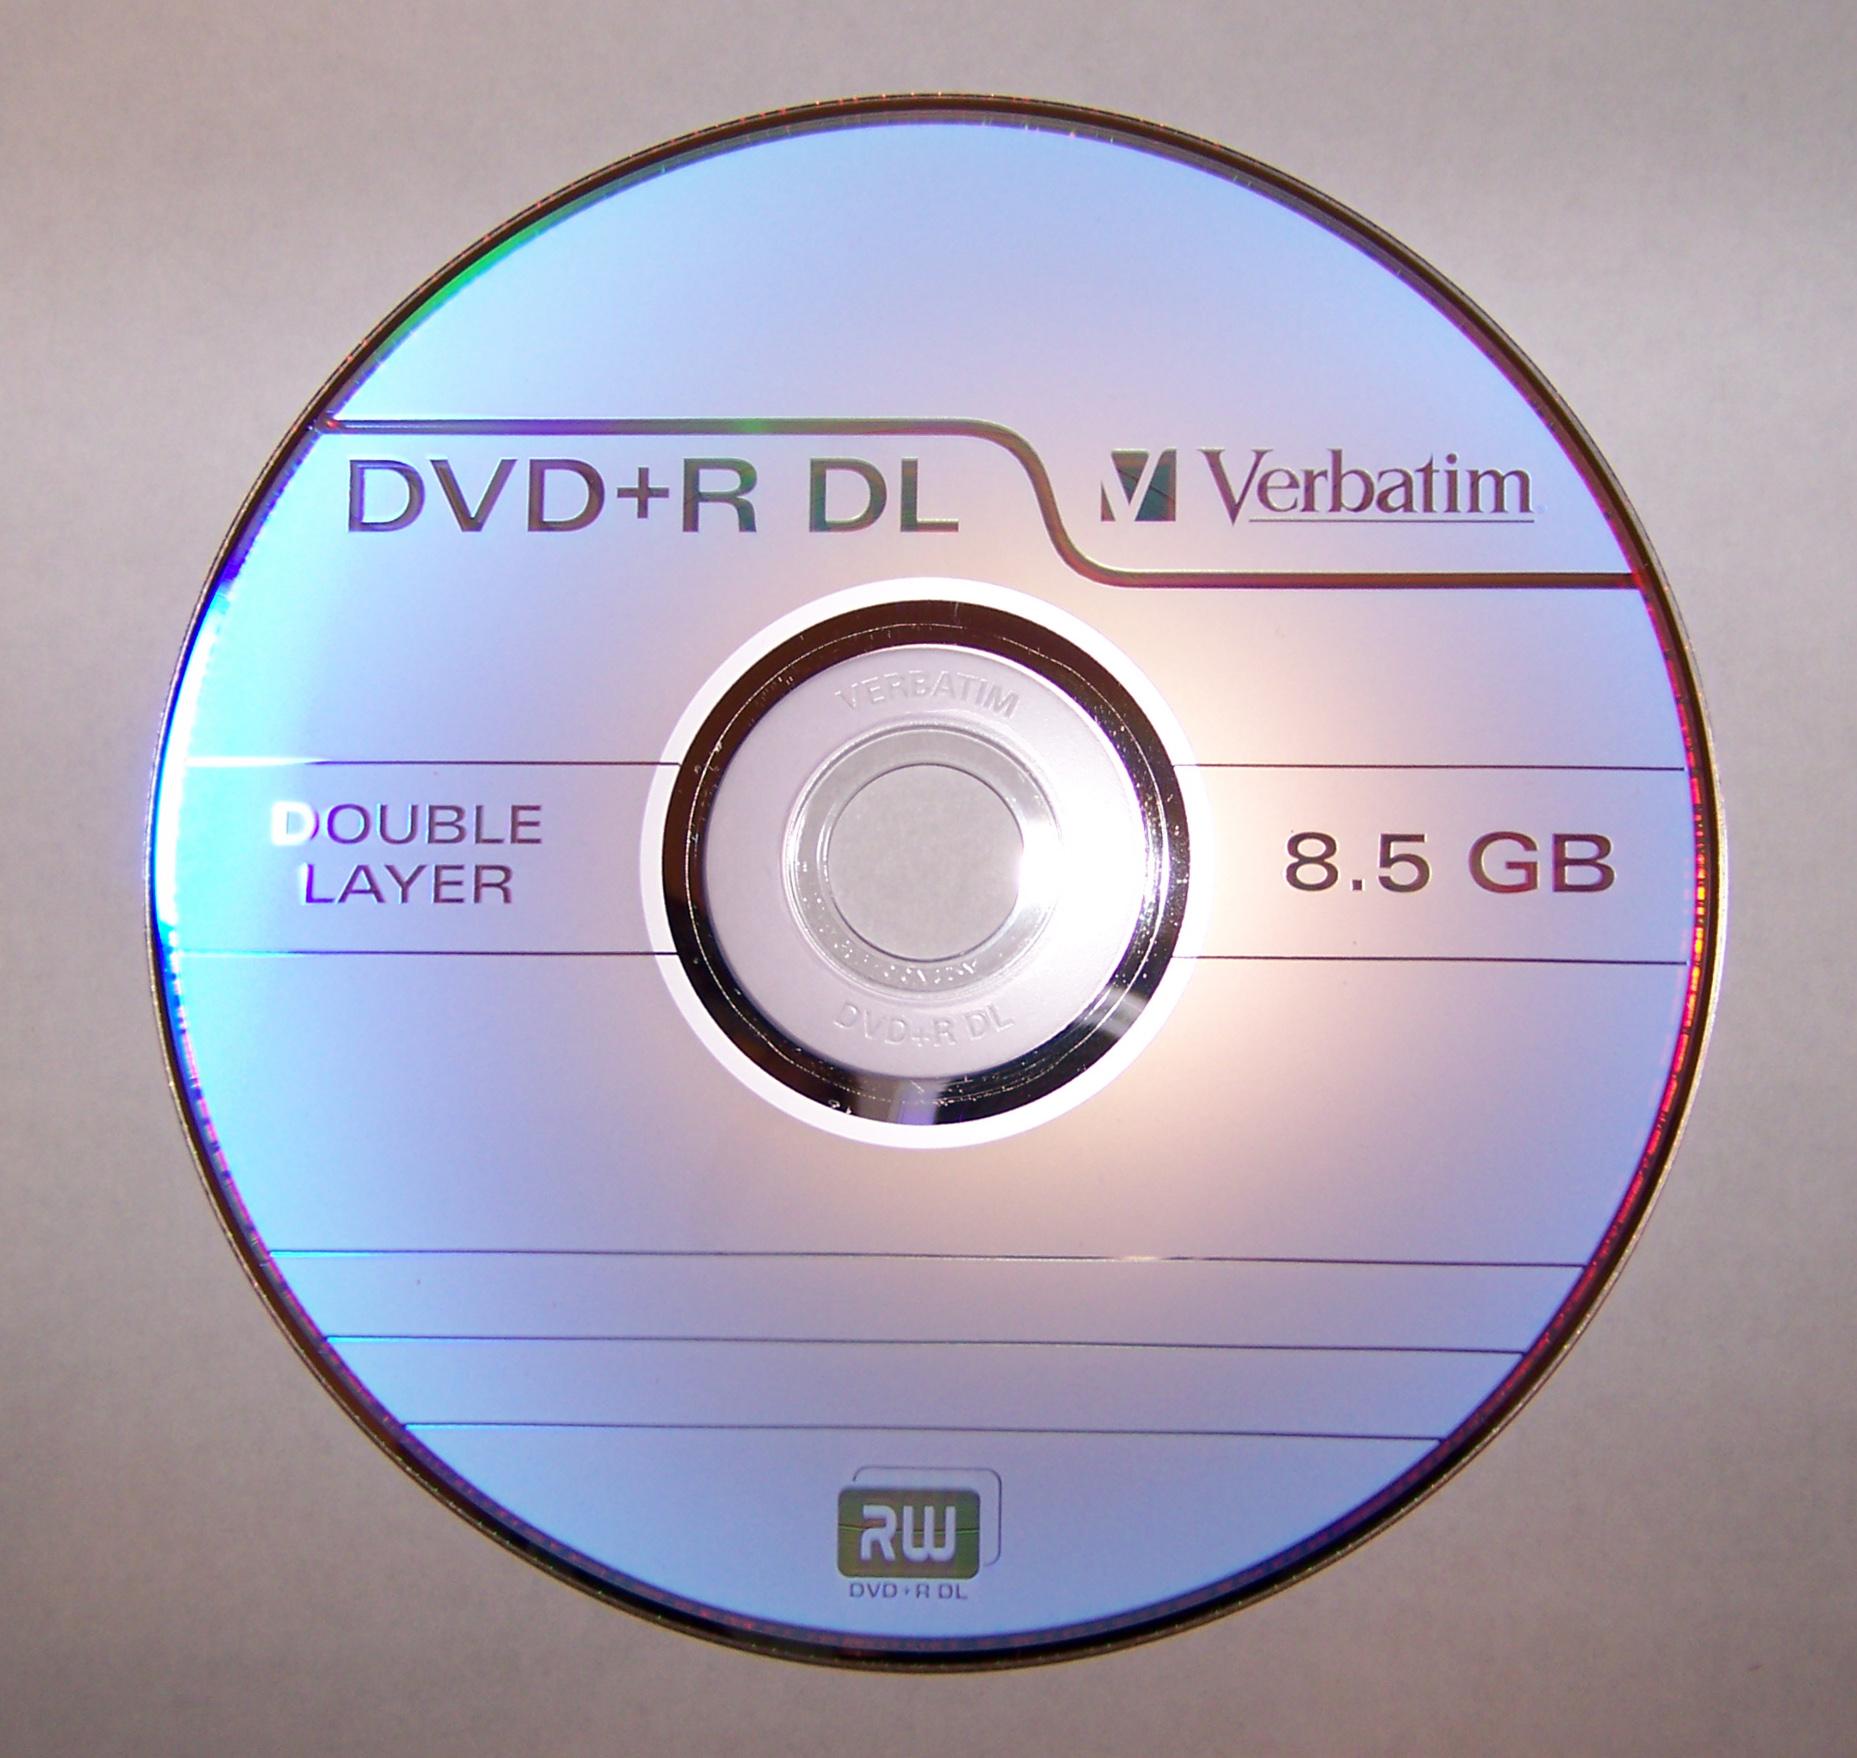 10 DVD -uri originale despre aerobic,Yoga,cure slabire,fitness etc. | arhiva onlyus.ro